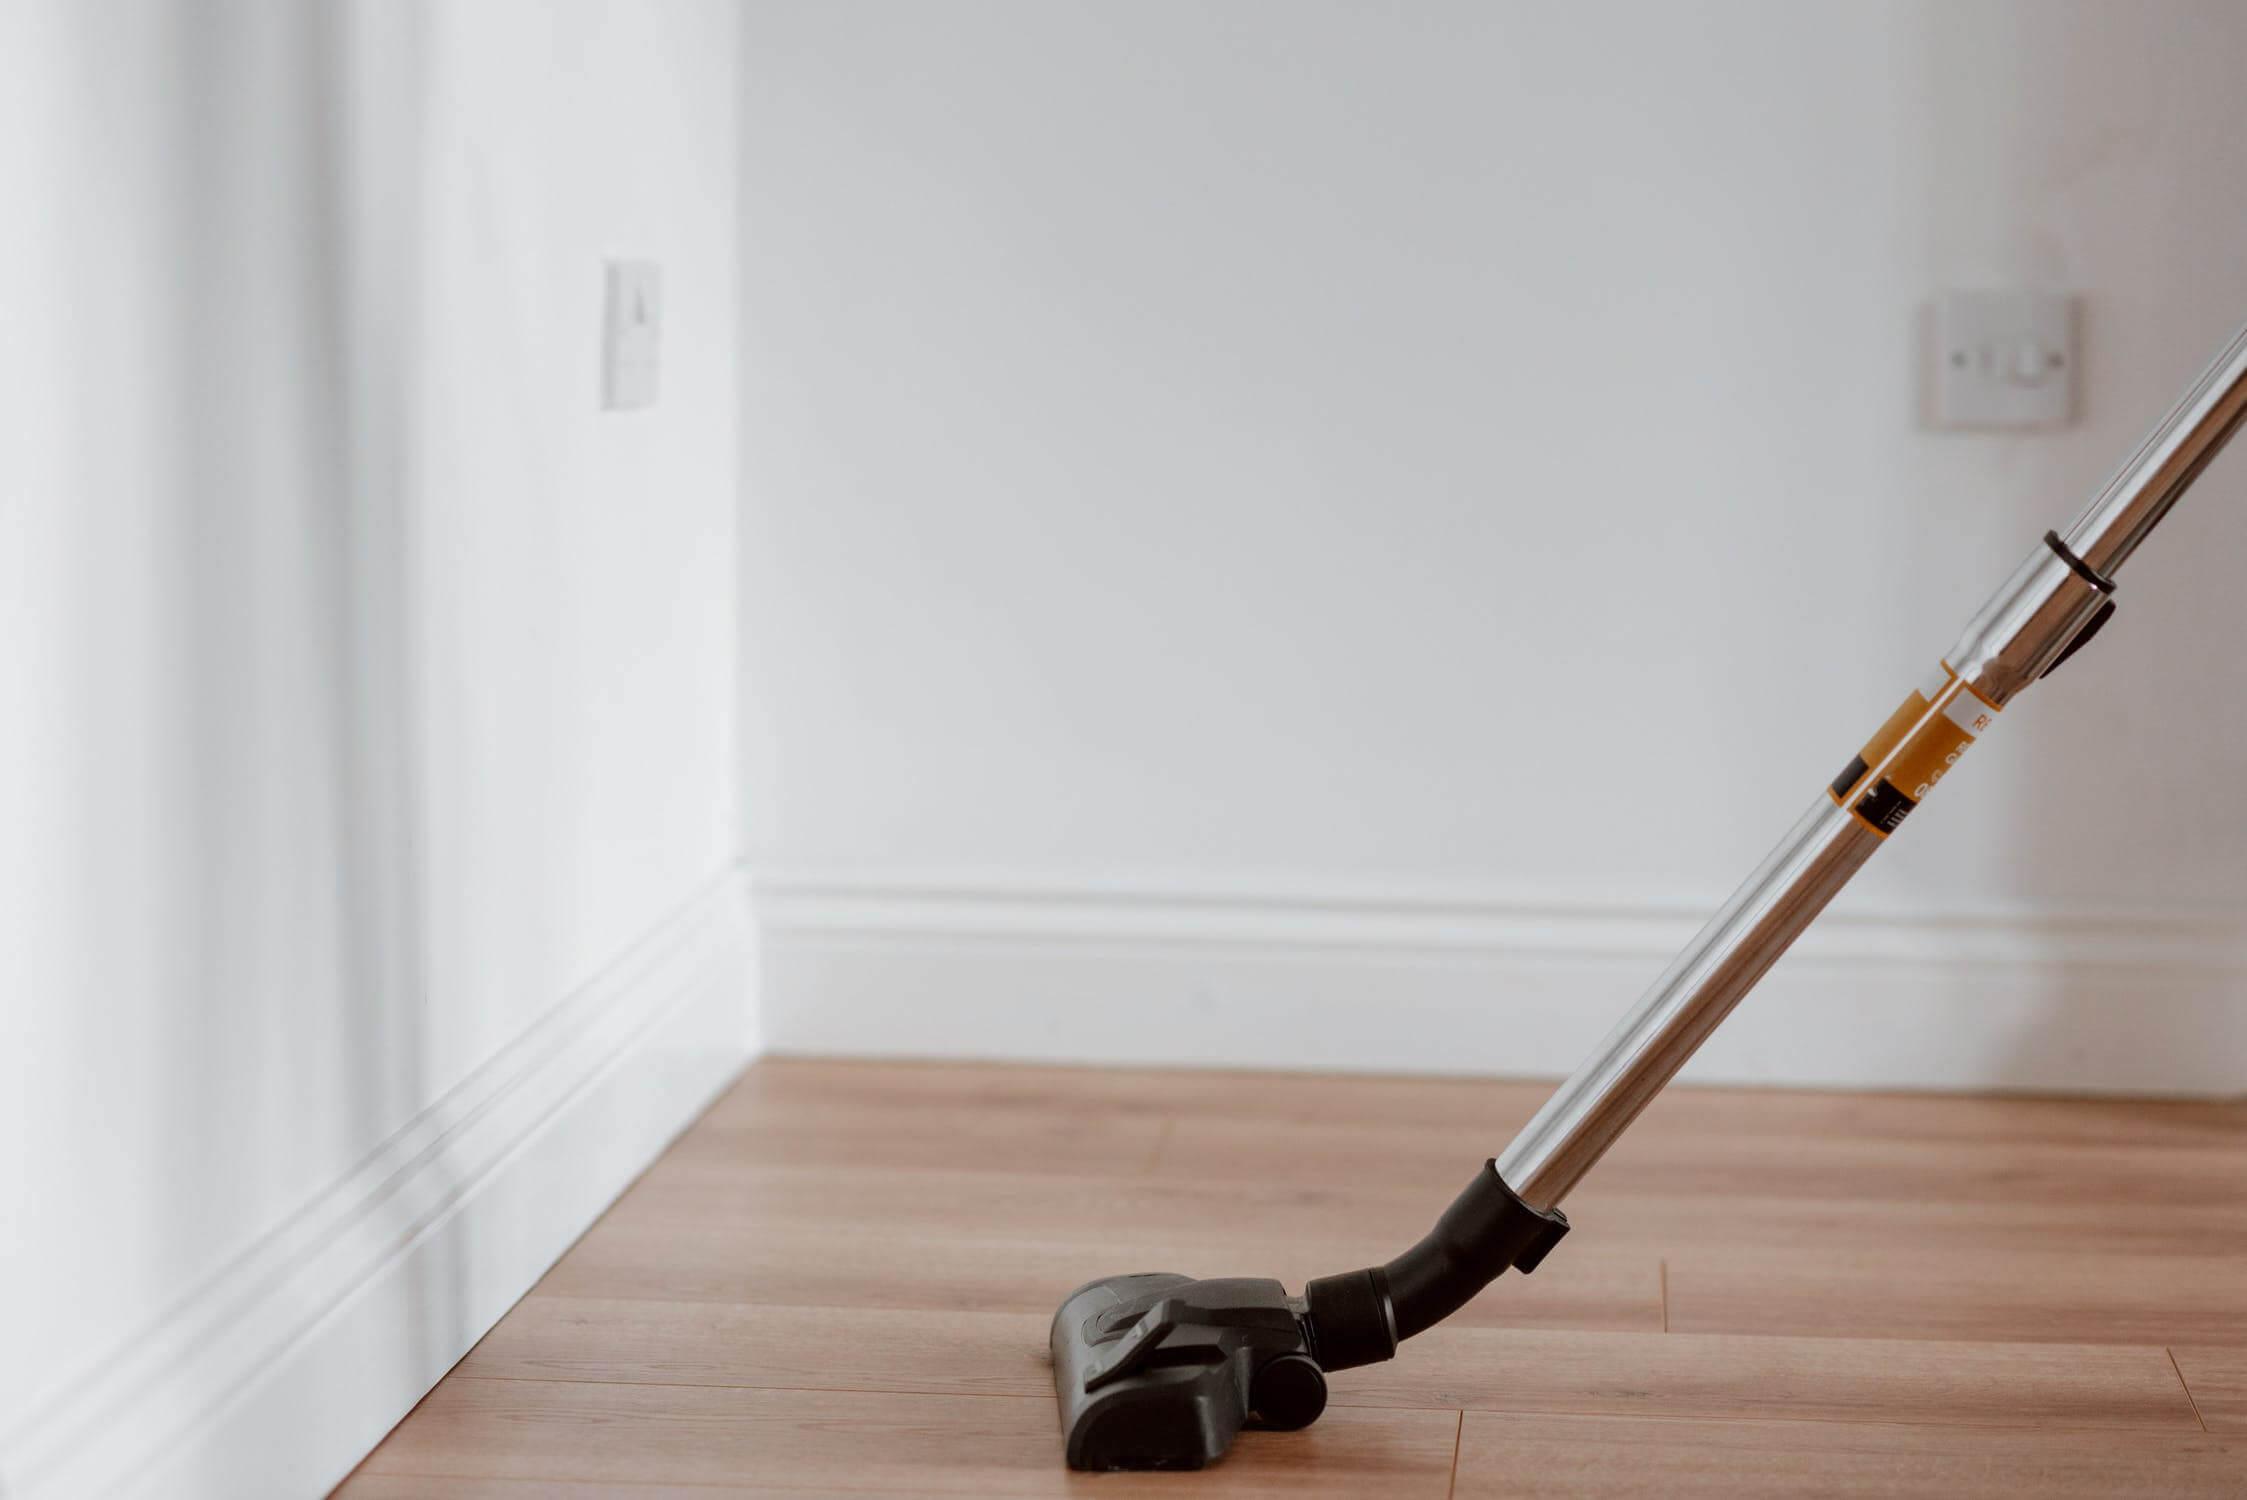 lightweight stick vacuum cleaning hardwood floors